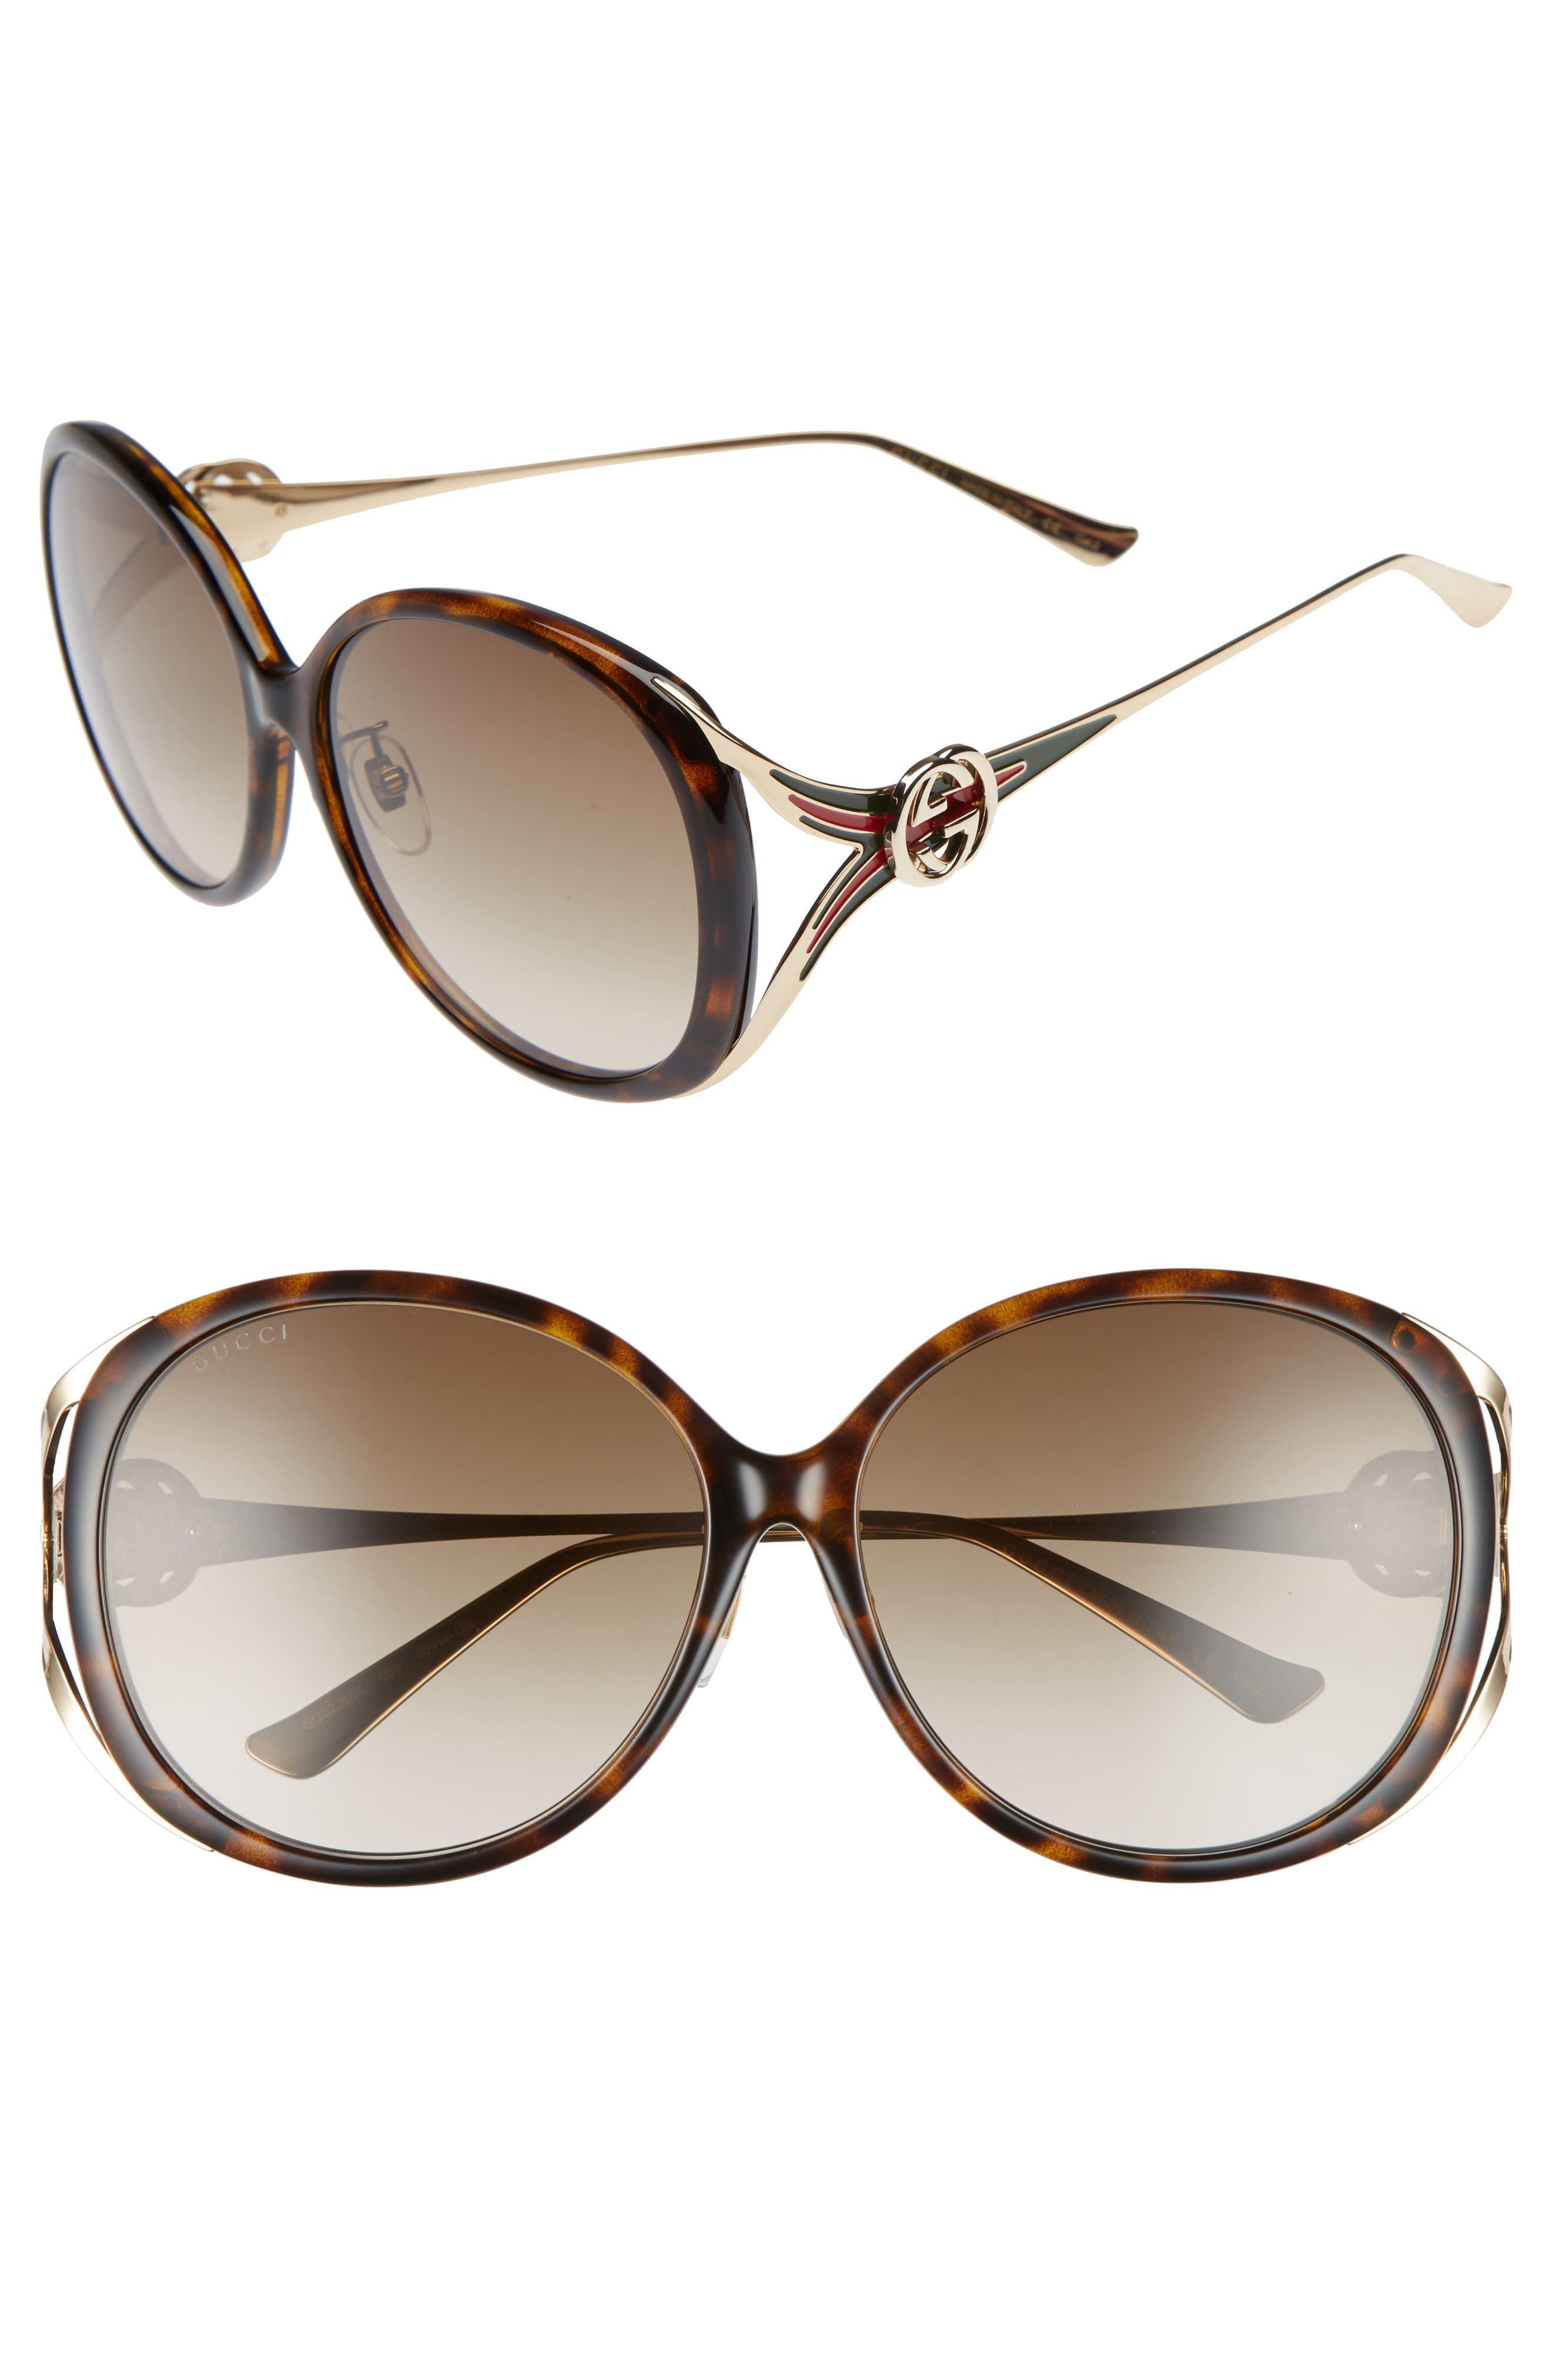 60mm Round Sunglasses,                             Main thumbnail 1, color,                             HAVANA